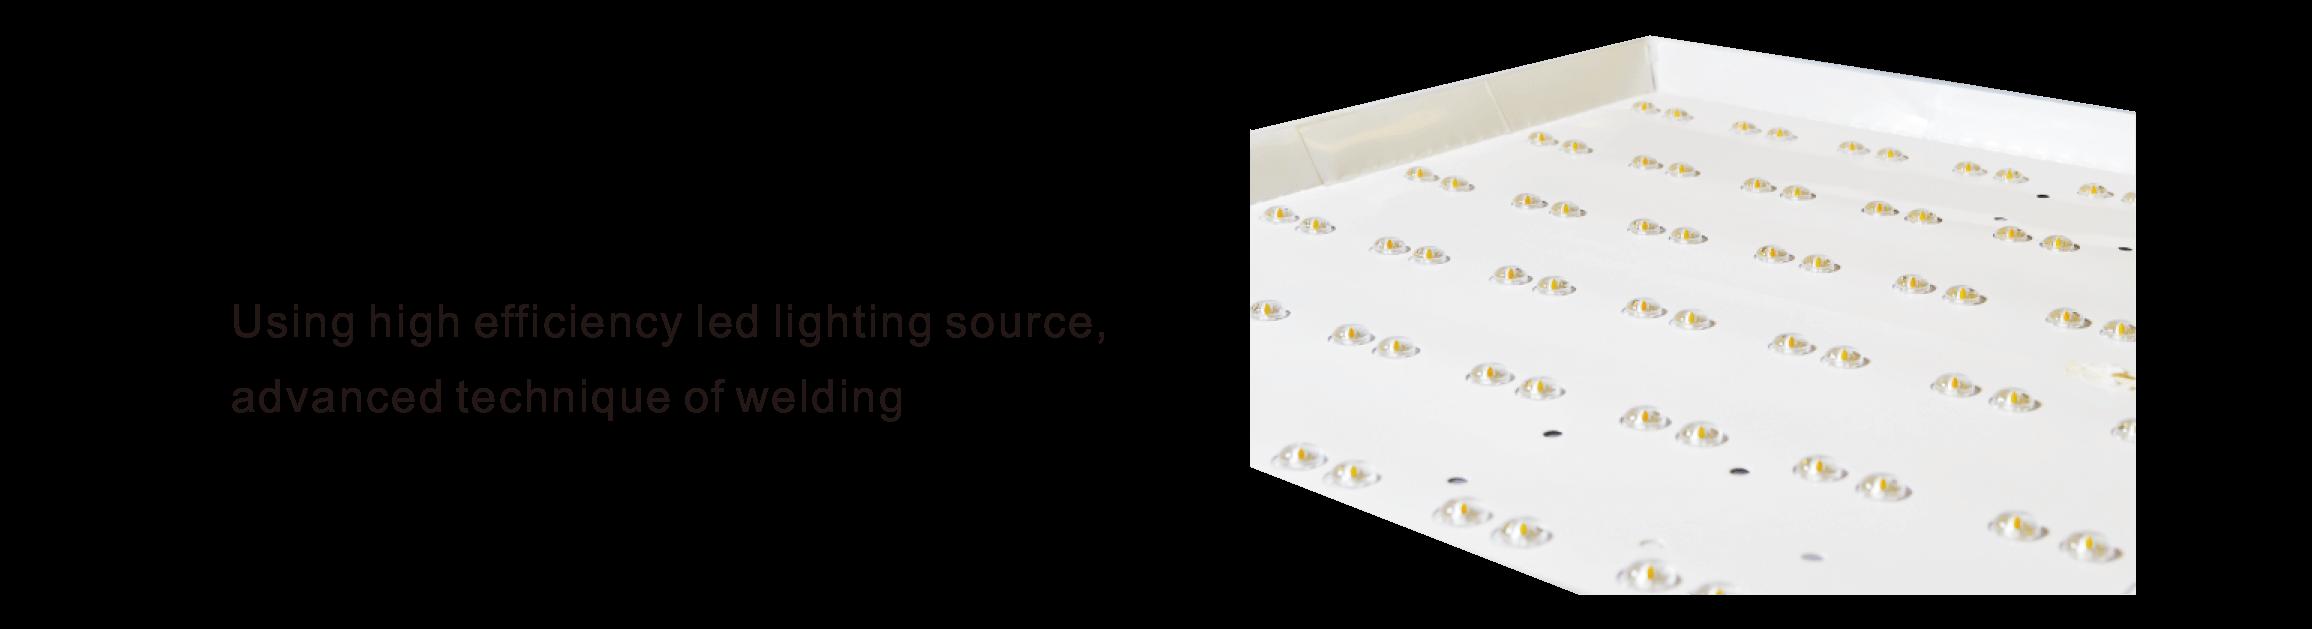 smart lighting control 2x2 2x4 1x4 high efficiency led flat panels lights